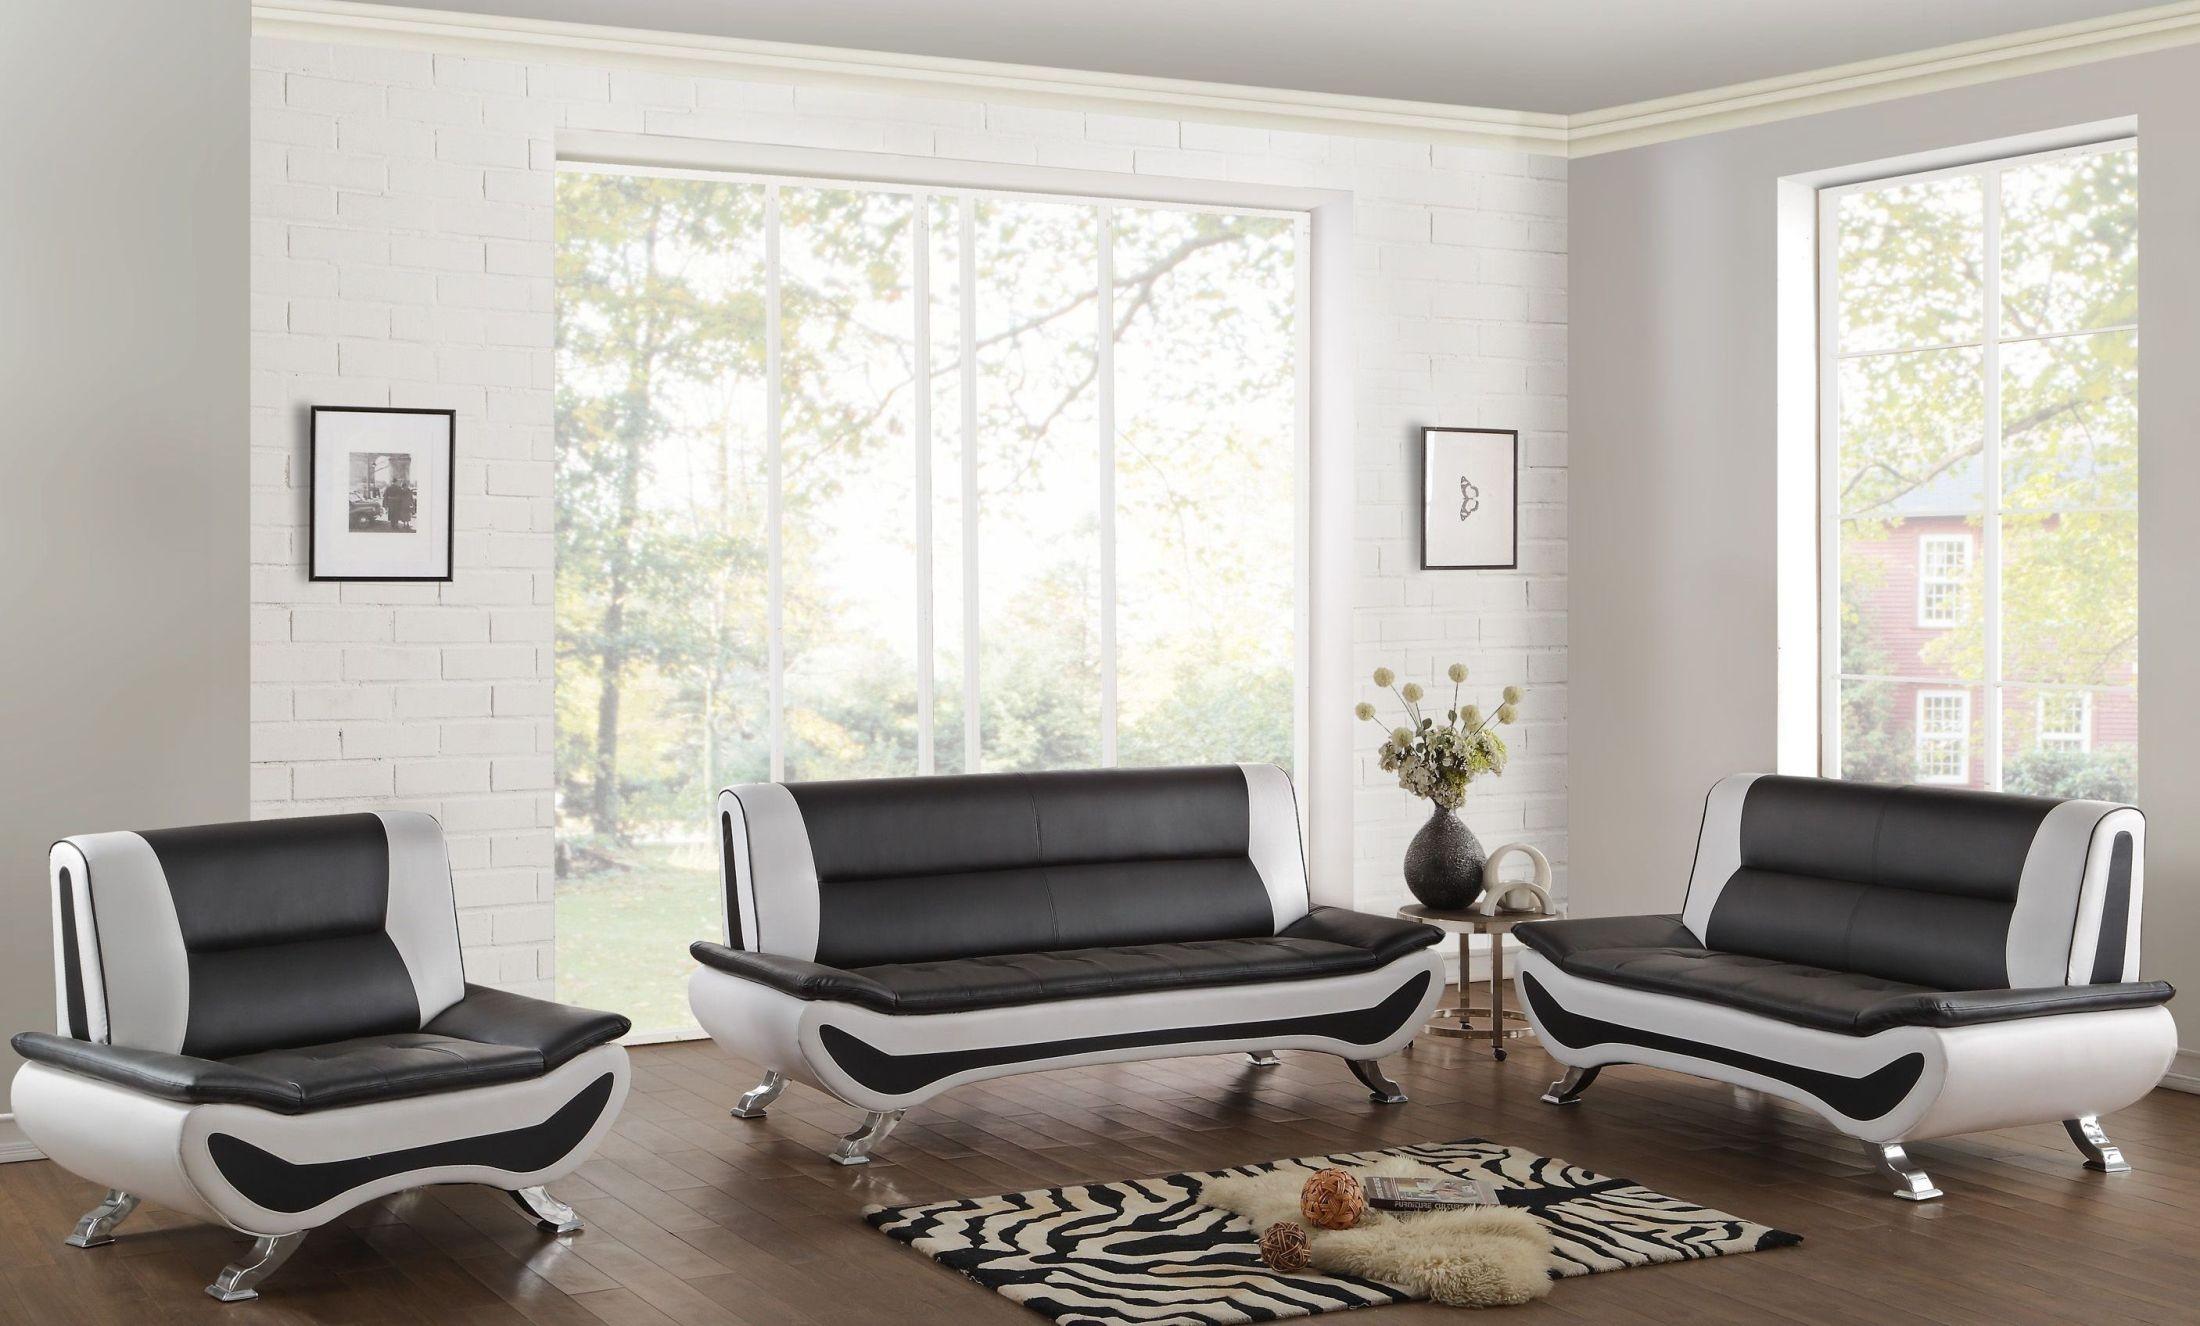 Veloce black and white living room set from homelegance - Black and white living room chairs ...